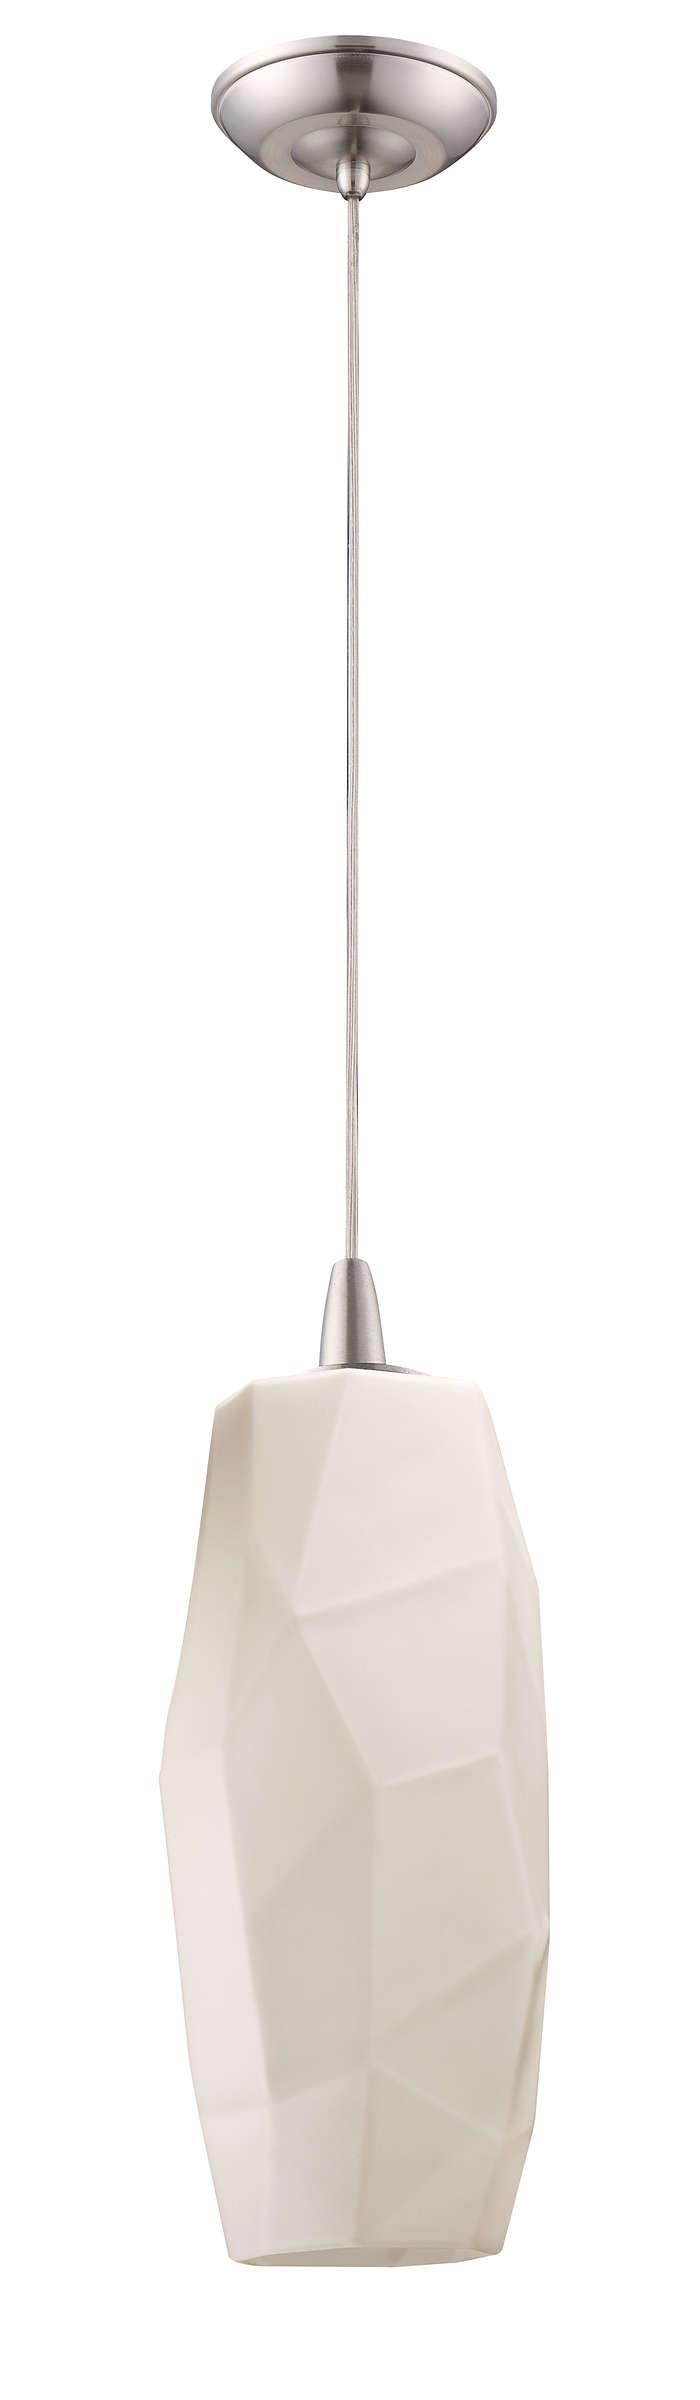 Facet 1-light pendant in Satin Nickel finish